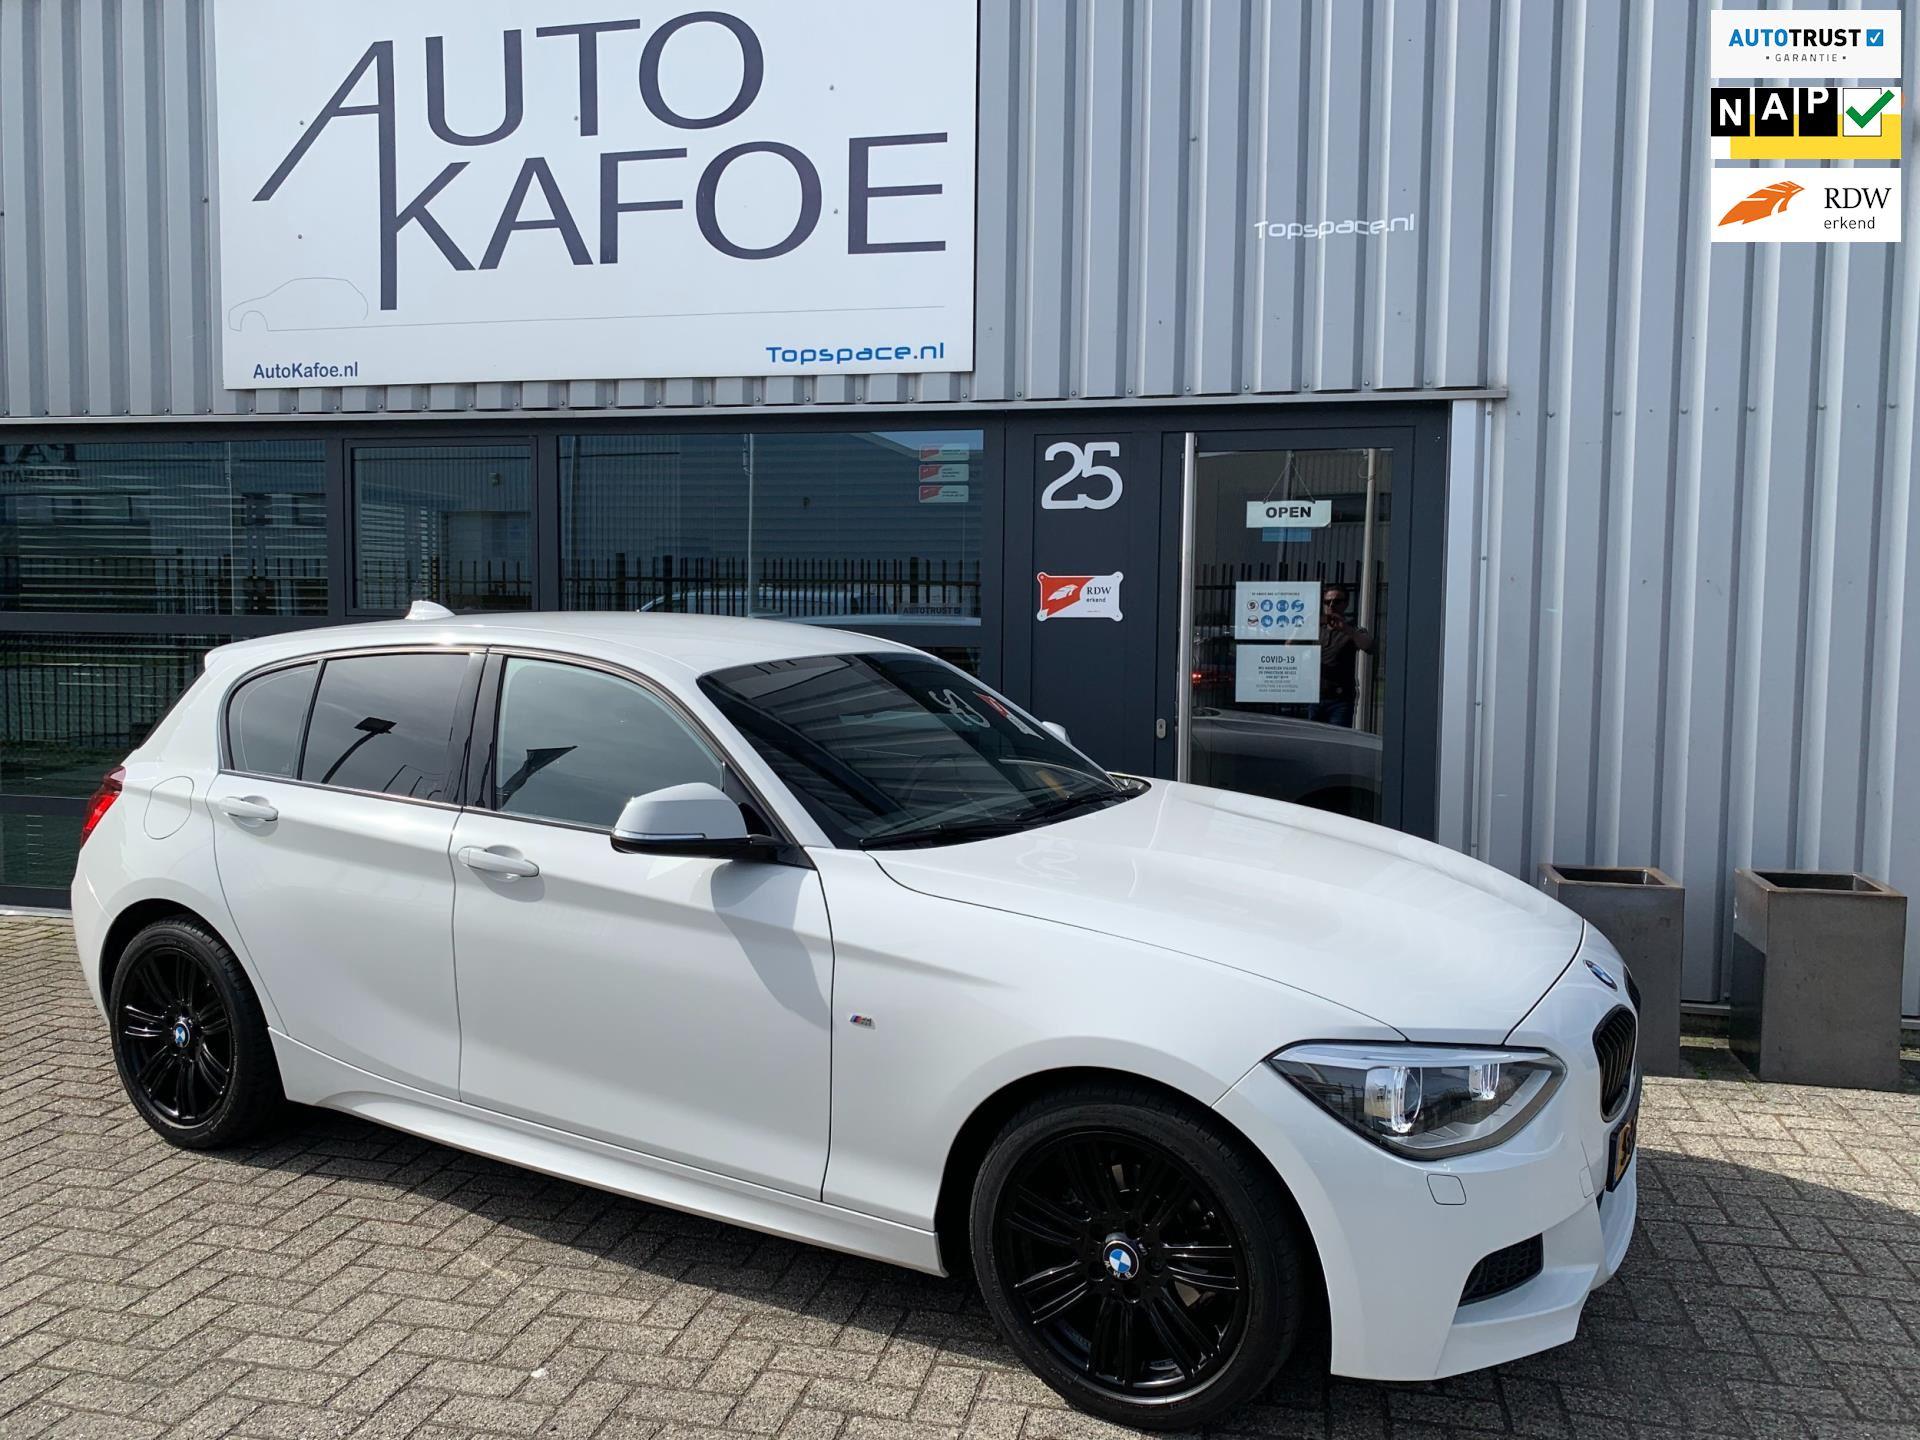 BMW 116i M Sport High Exe Automaat ECC Navi Xenon Cruise 17lmv occasion - AutoKafoe v.o.f.